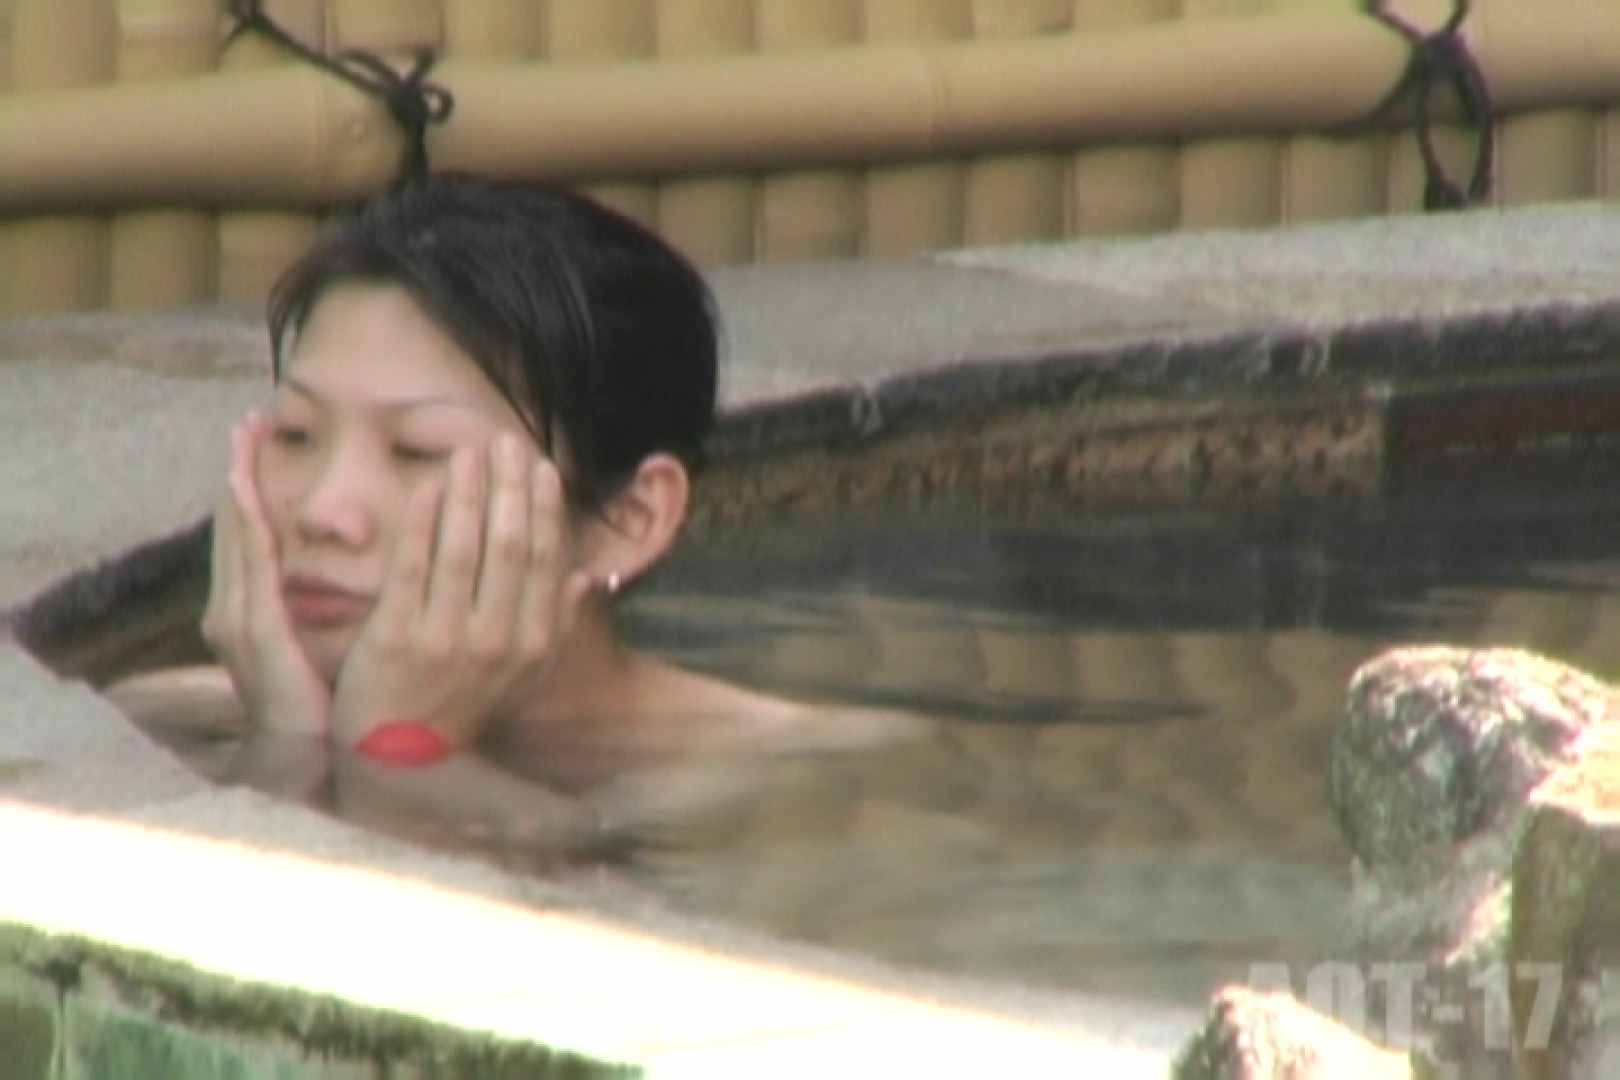 Aquaな露天風呂Vol.850 OLのエロ生活 | 露天風呂  76連発 7